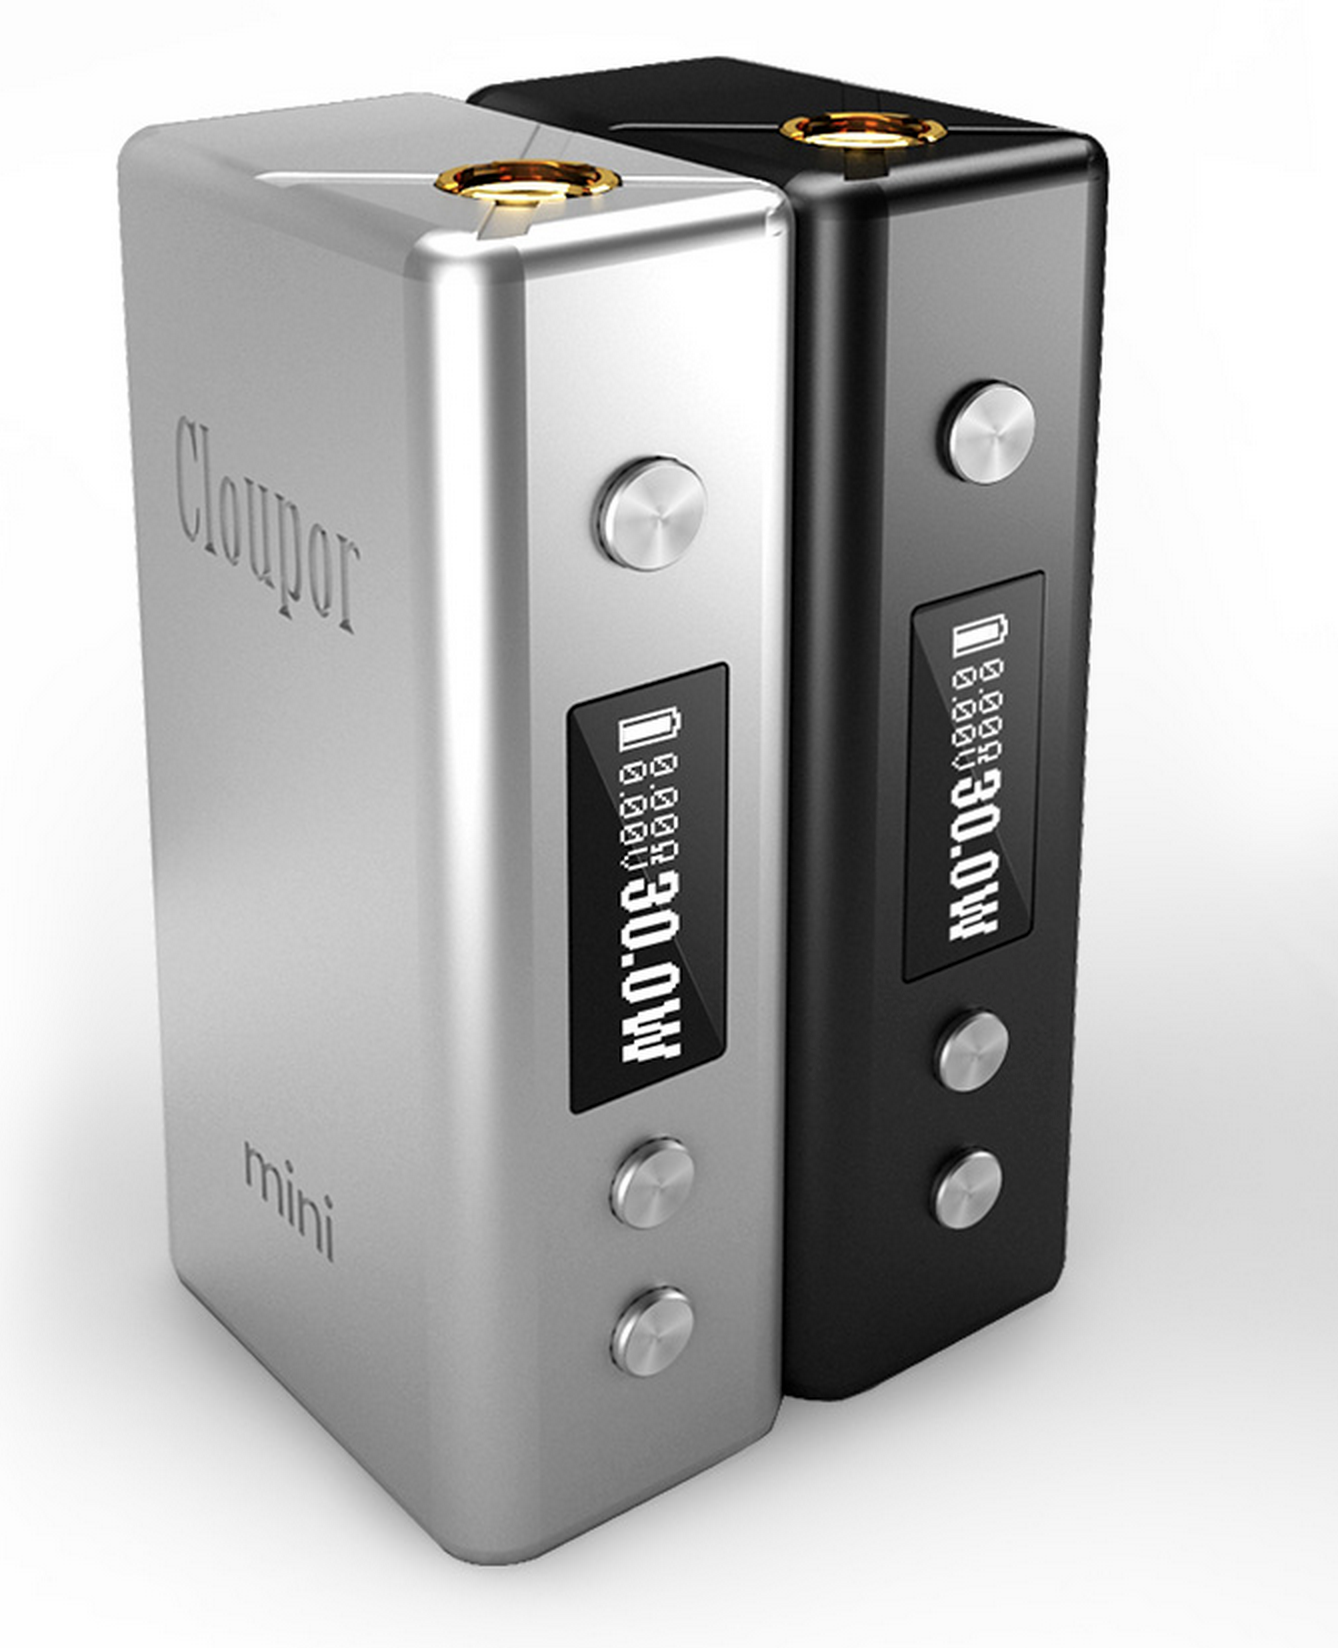 Cloupor Mini Review: A Box Mod of EPIC Proportions